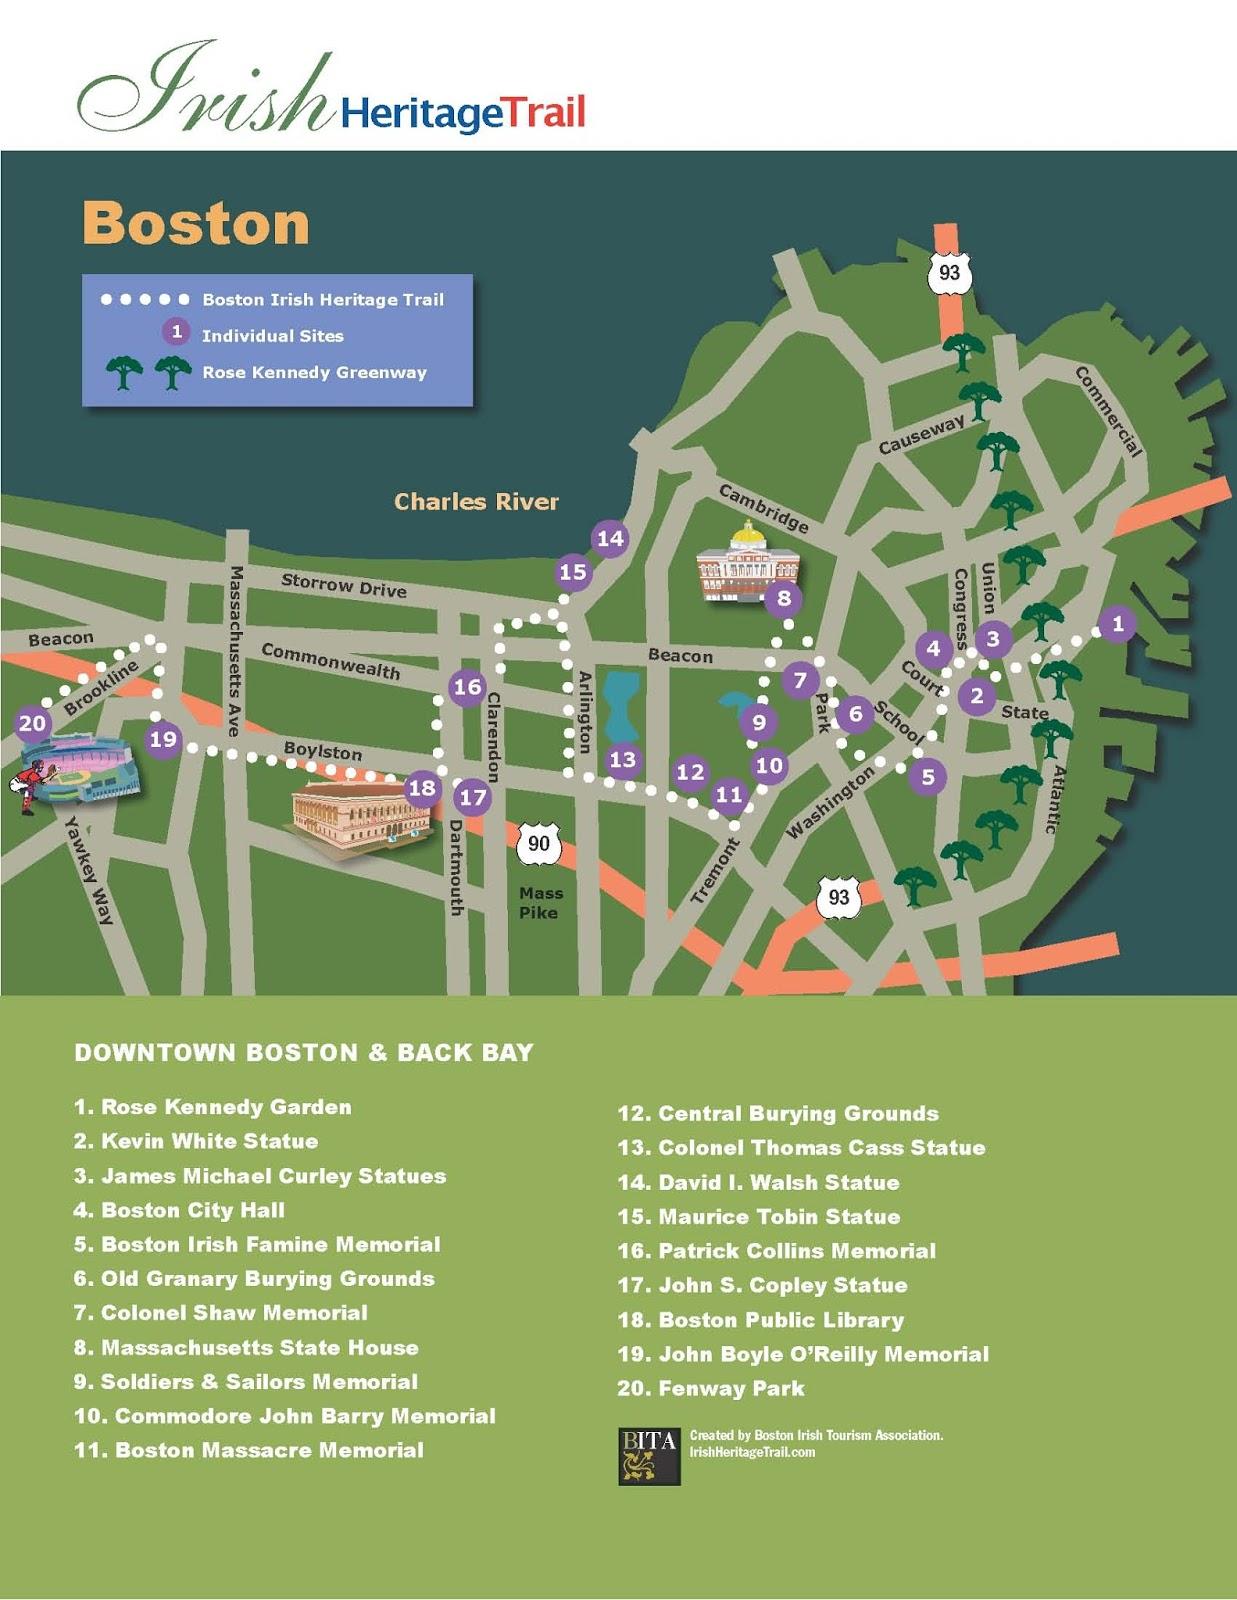 Boston Tour Guide Association